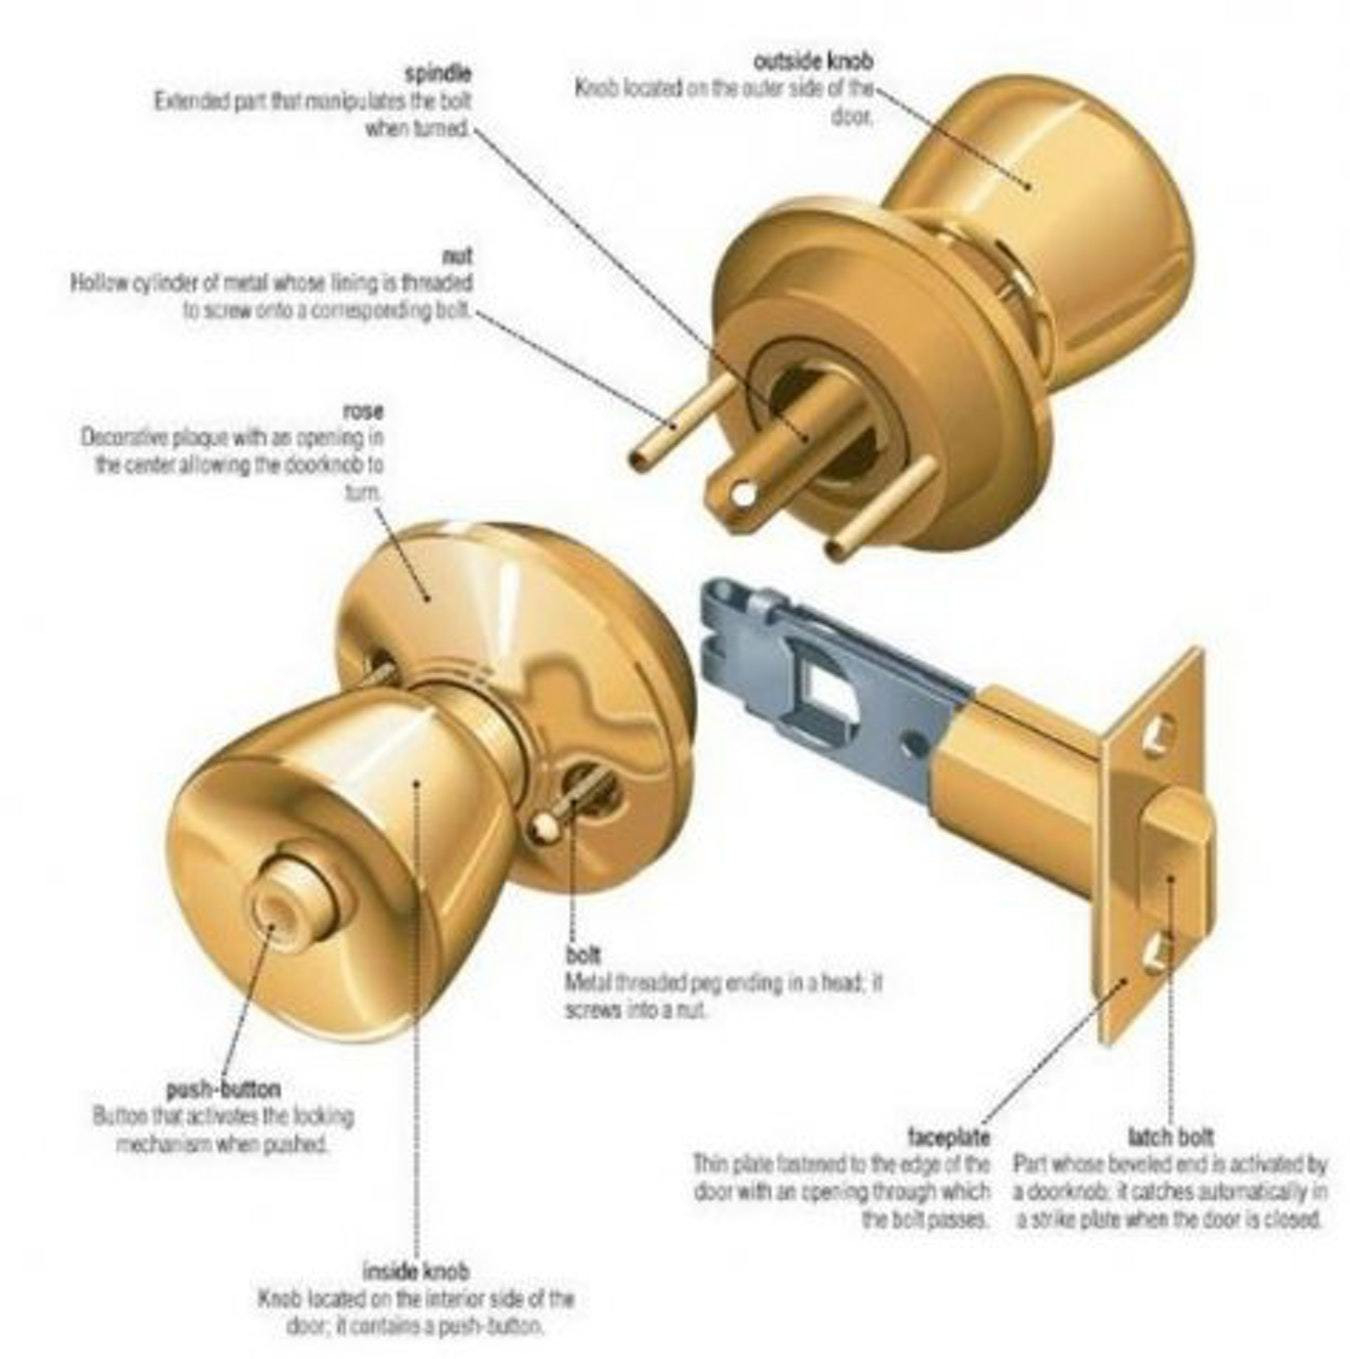 Anatomy Of A Door Knob Lock  U2022 Knobs Ideas Site